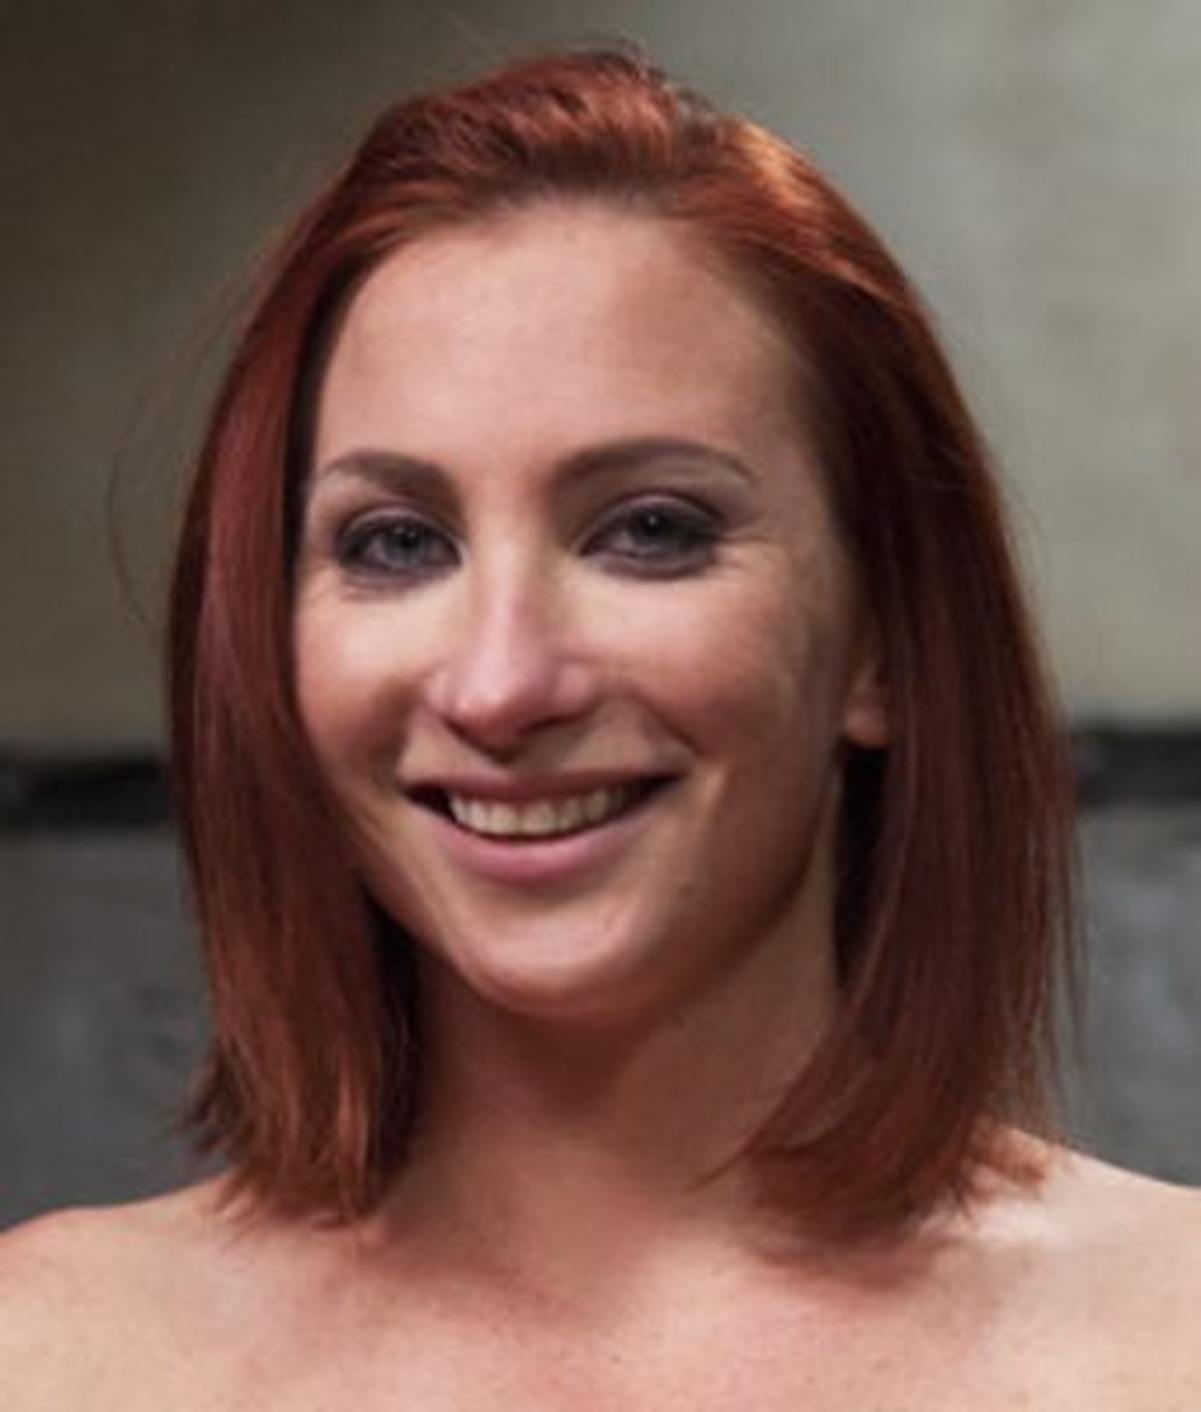 Sophia Locke naked 568